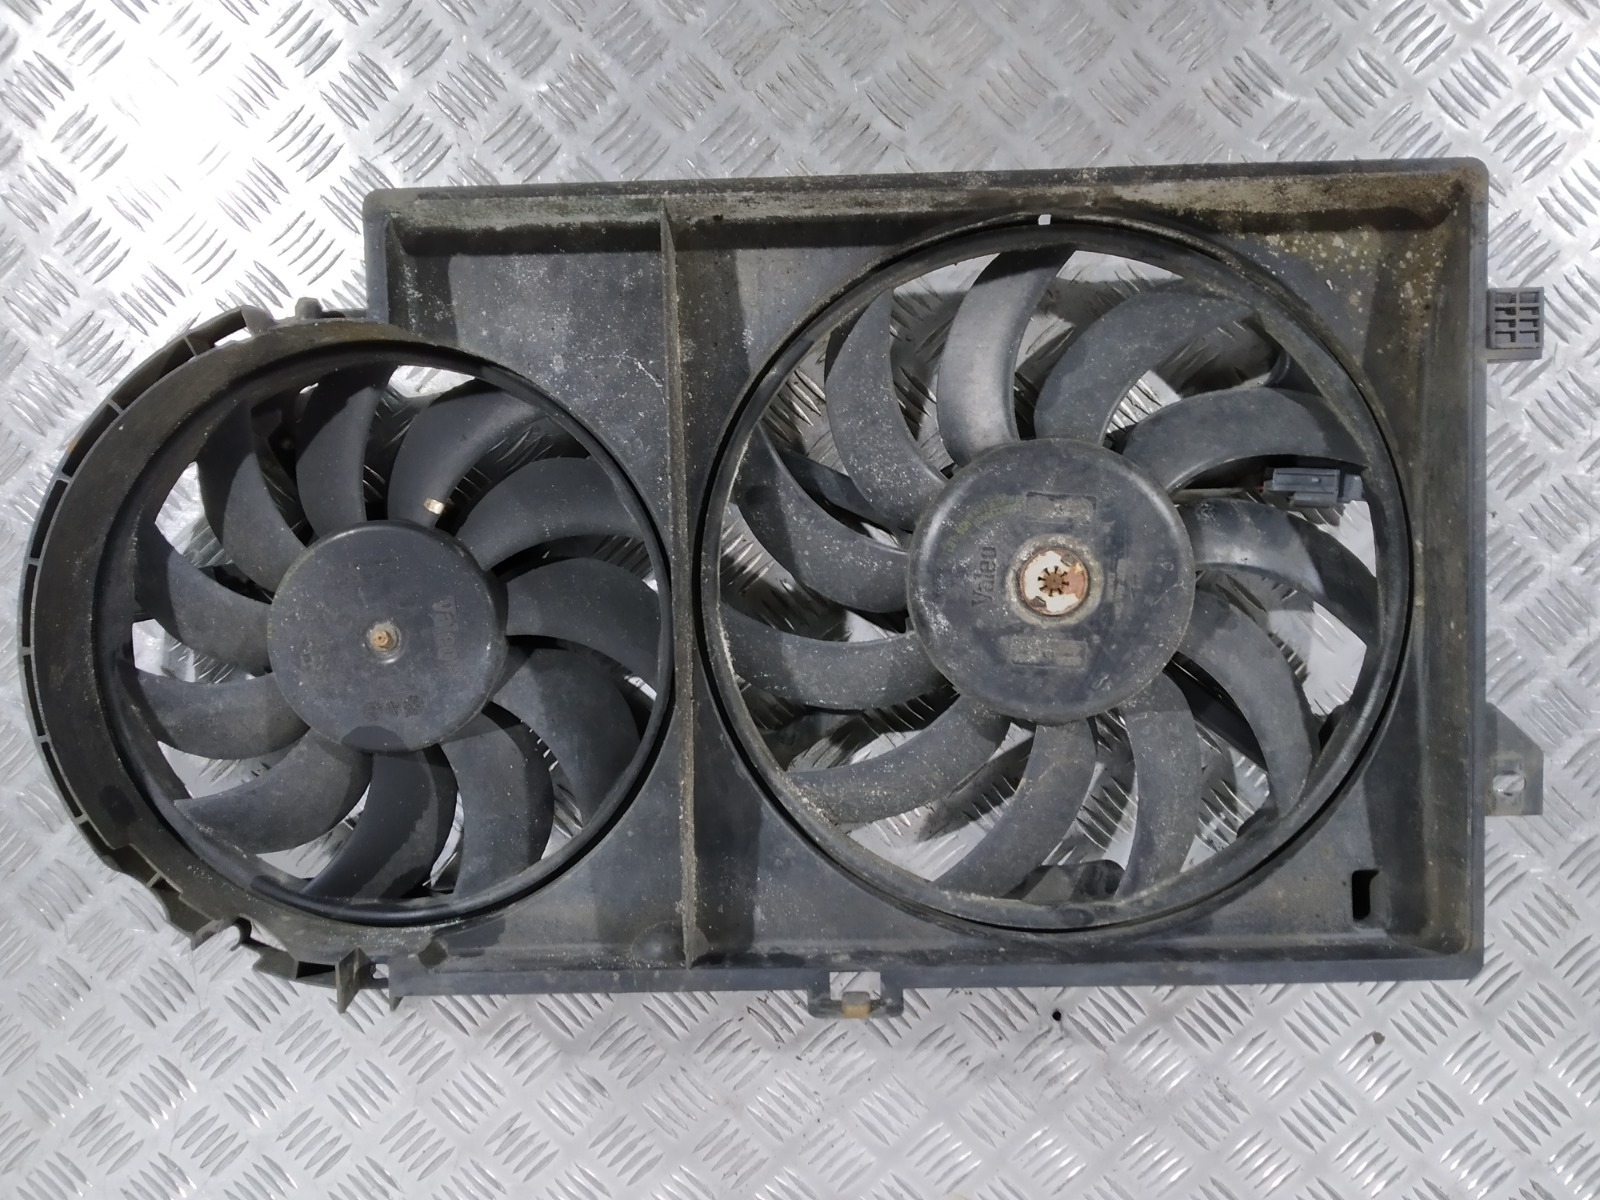 Вентилятор радиатора Chrysler Grand Voyager 2.5 CRDI 2003 (б/у)